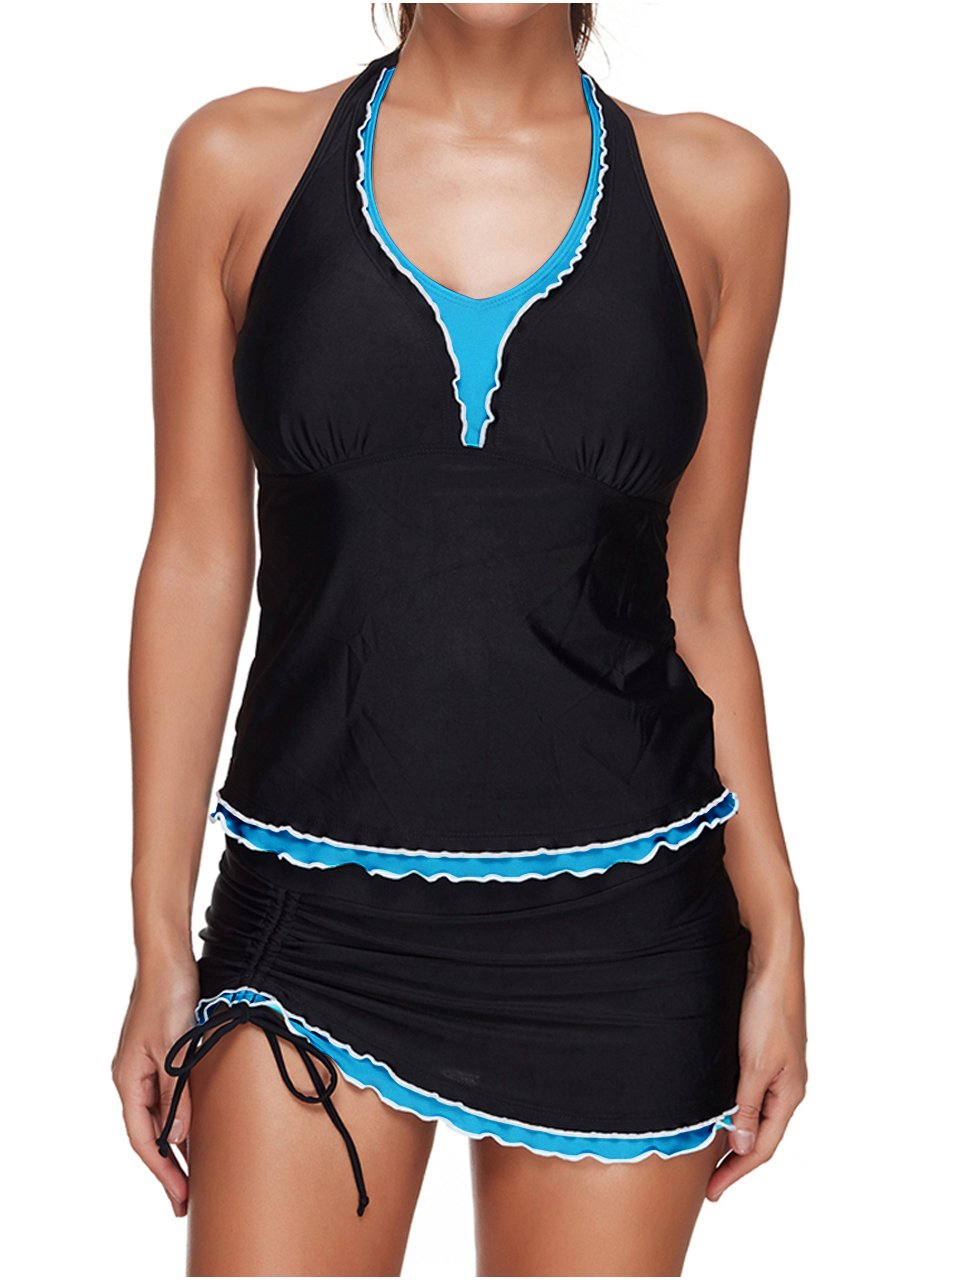 Ayliss Women\'s 2 Piece Halter Tankini Swimsuits with Panty Skirt Tummy Control Black US 4-6